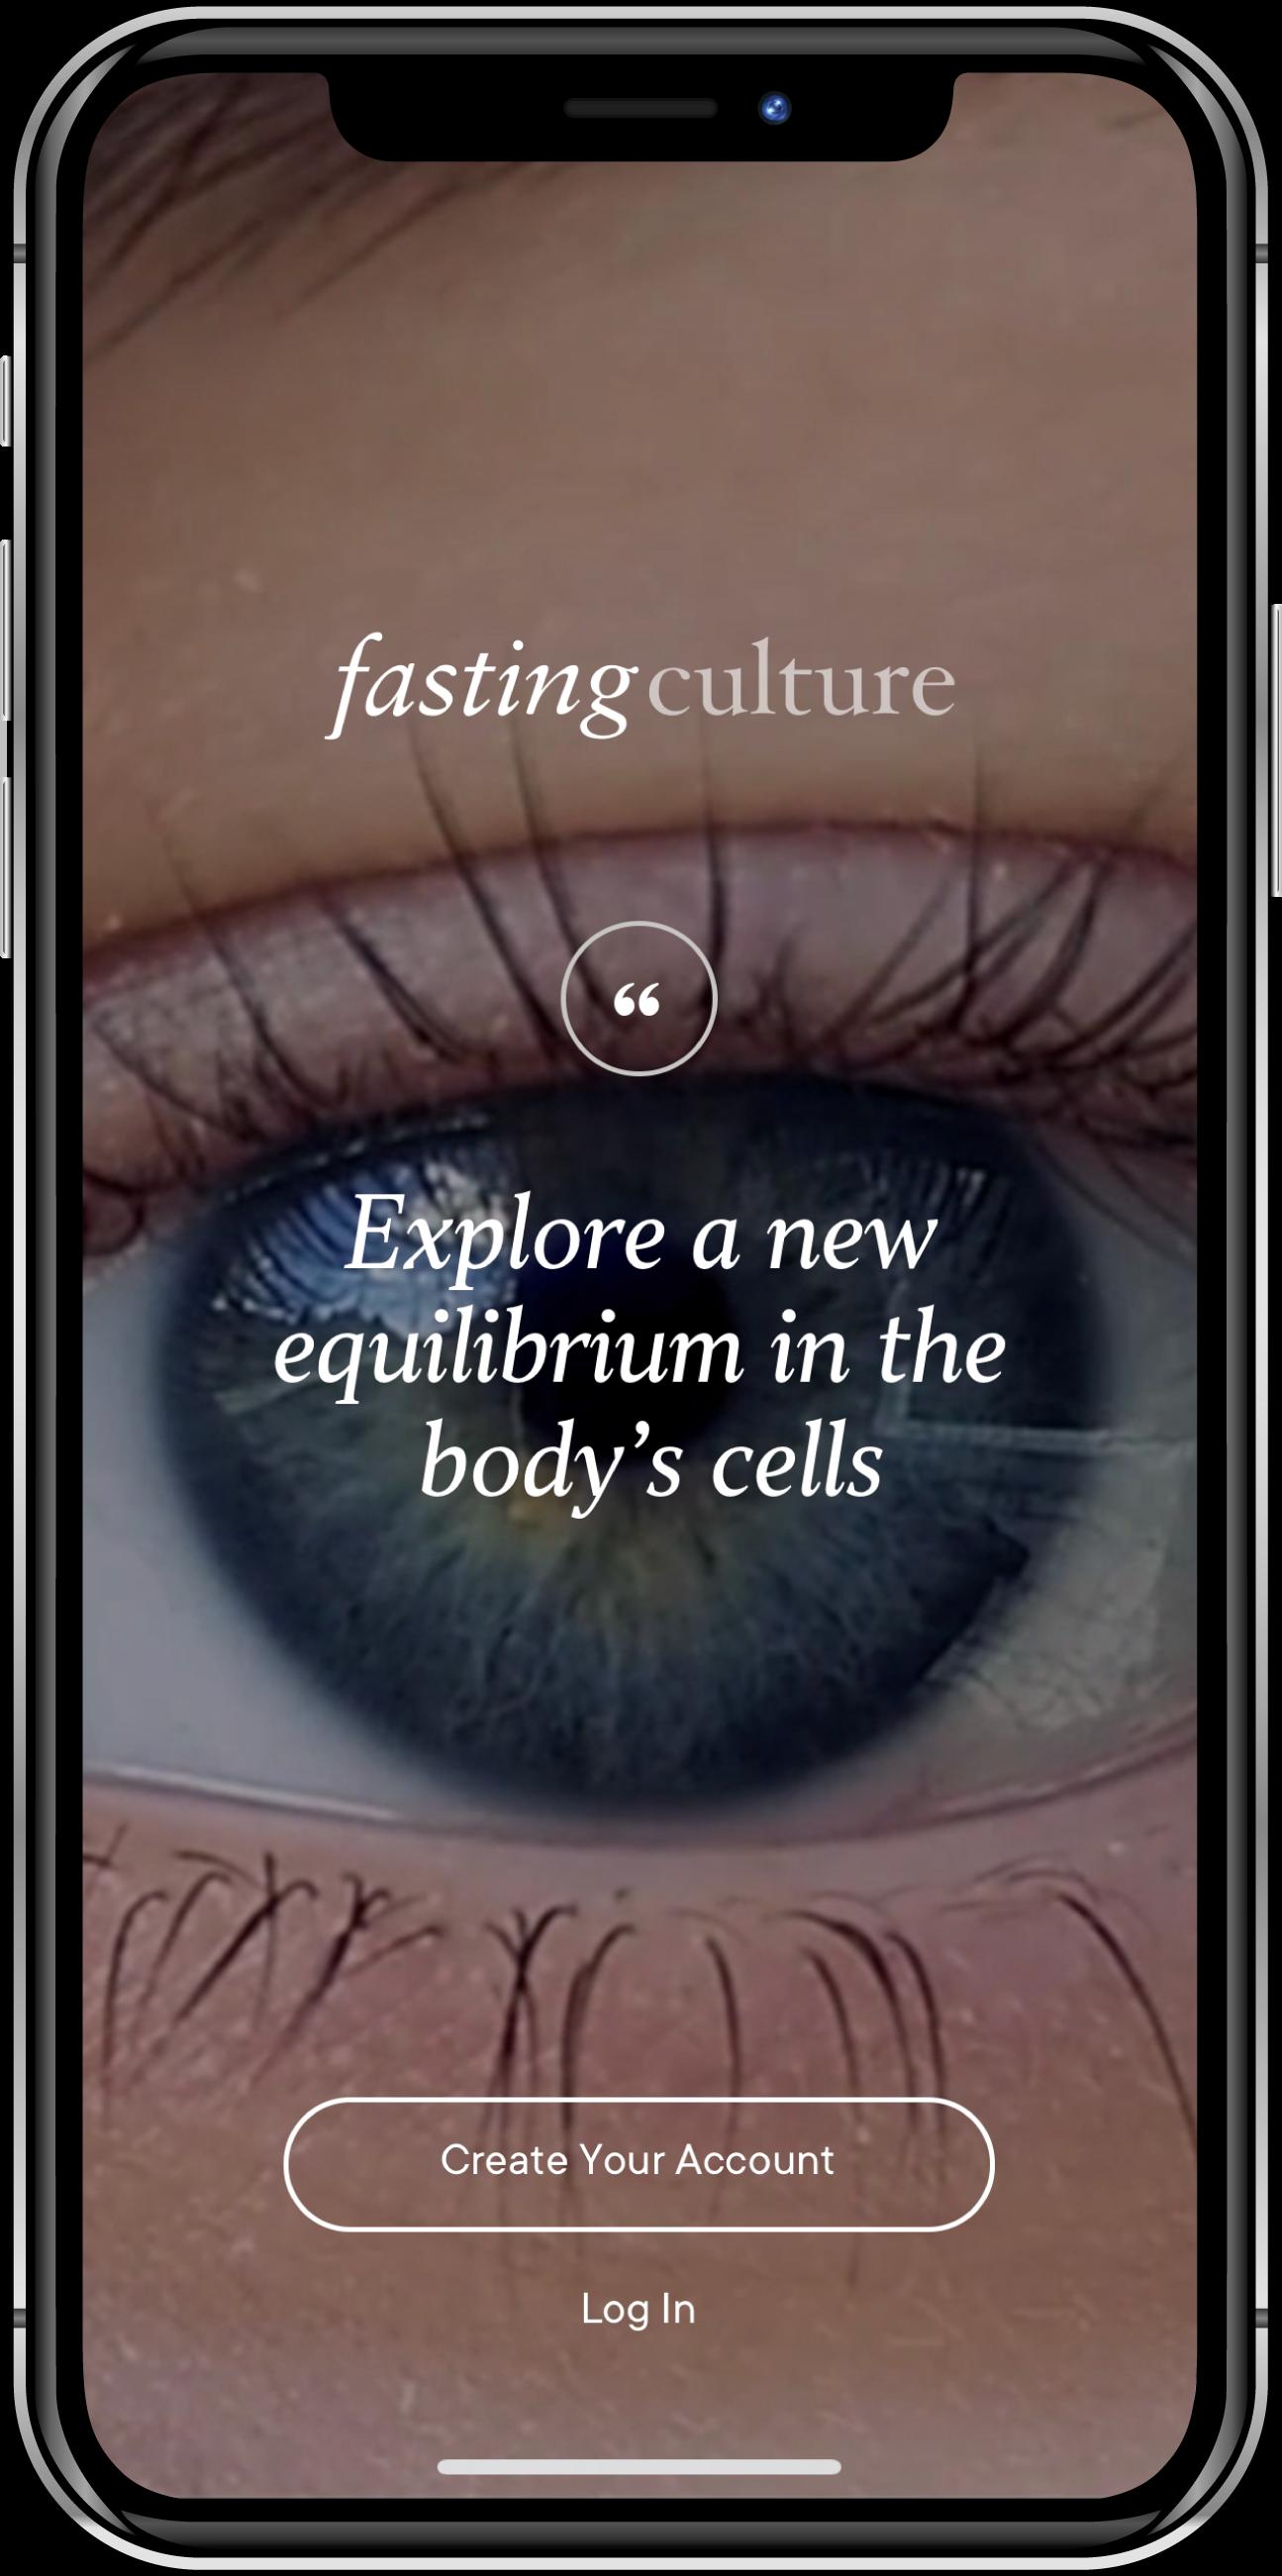 Fasting Culture App - Login